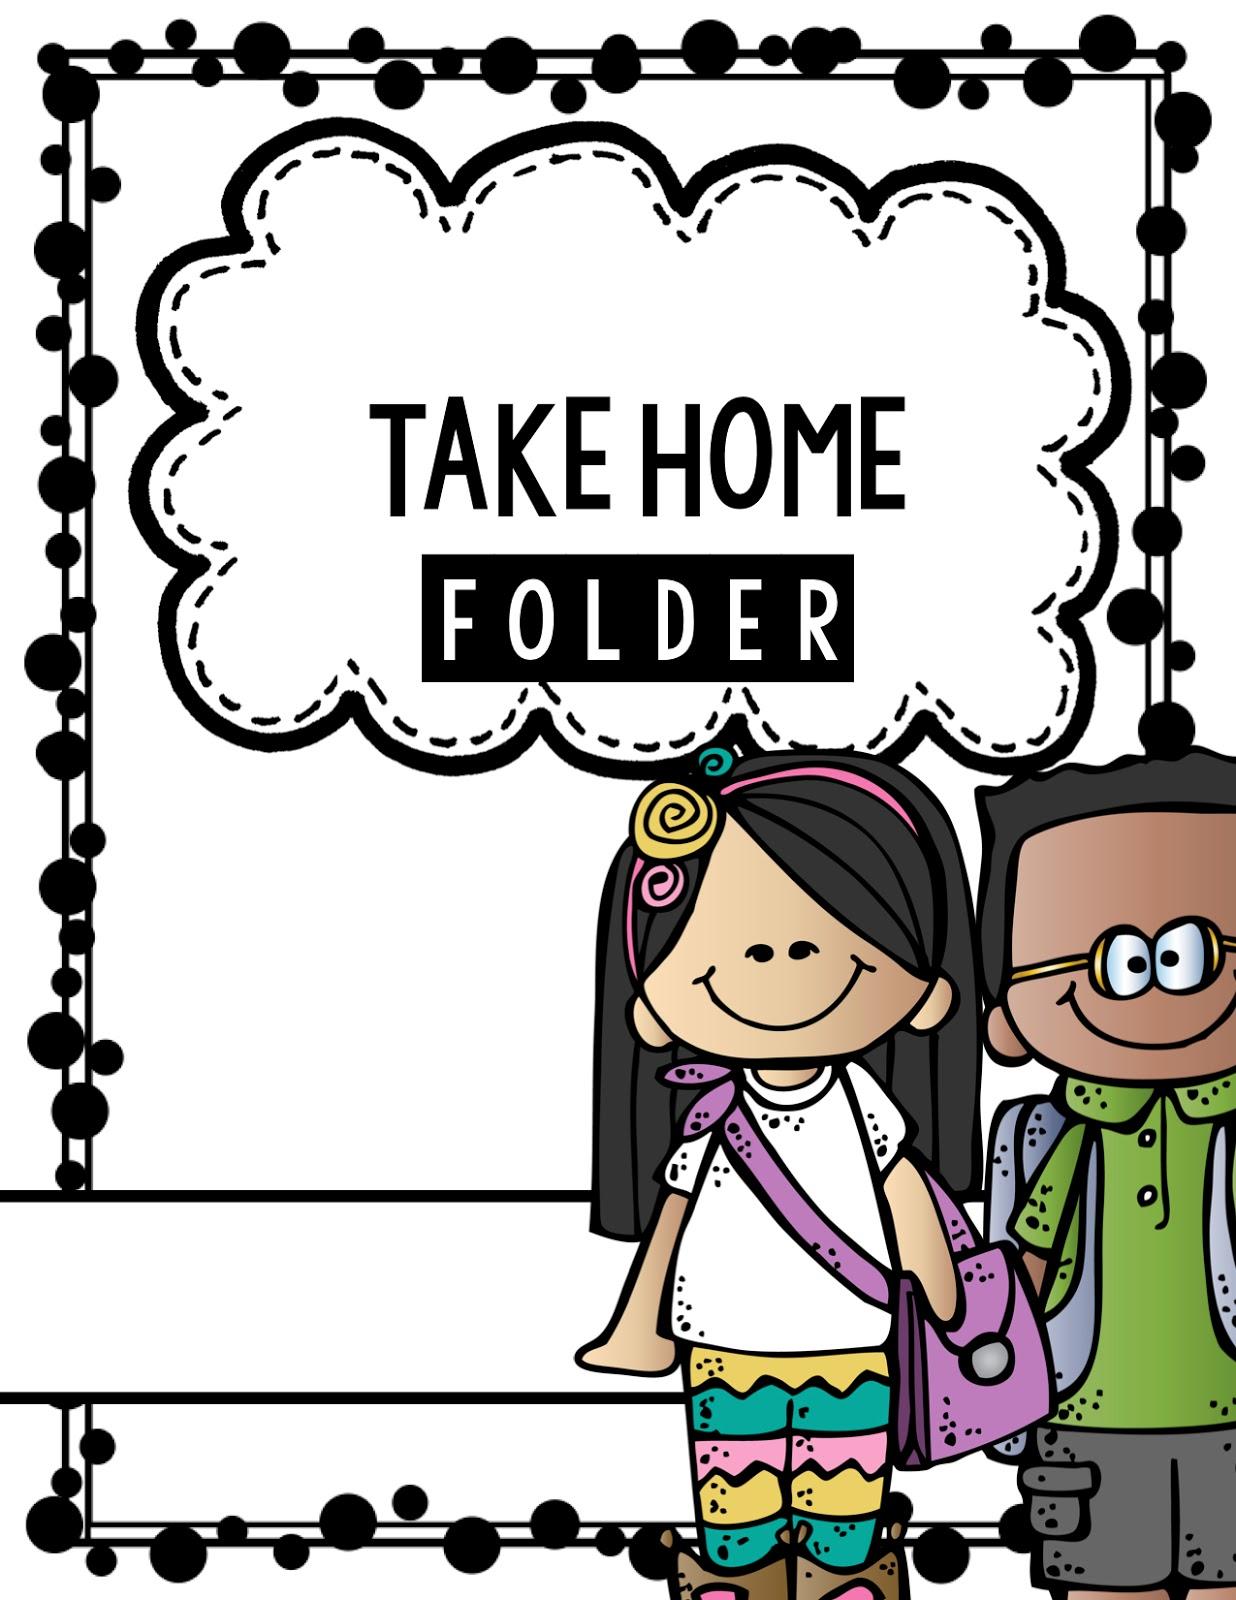 Take Home Folder Clipart